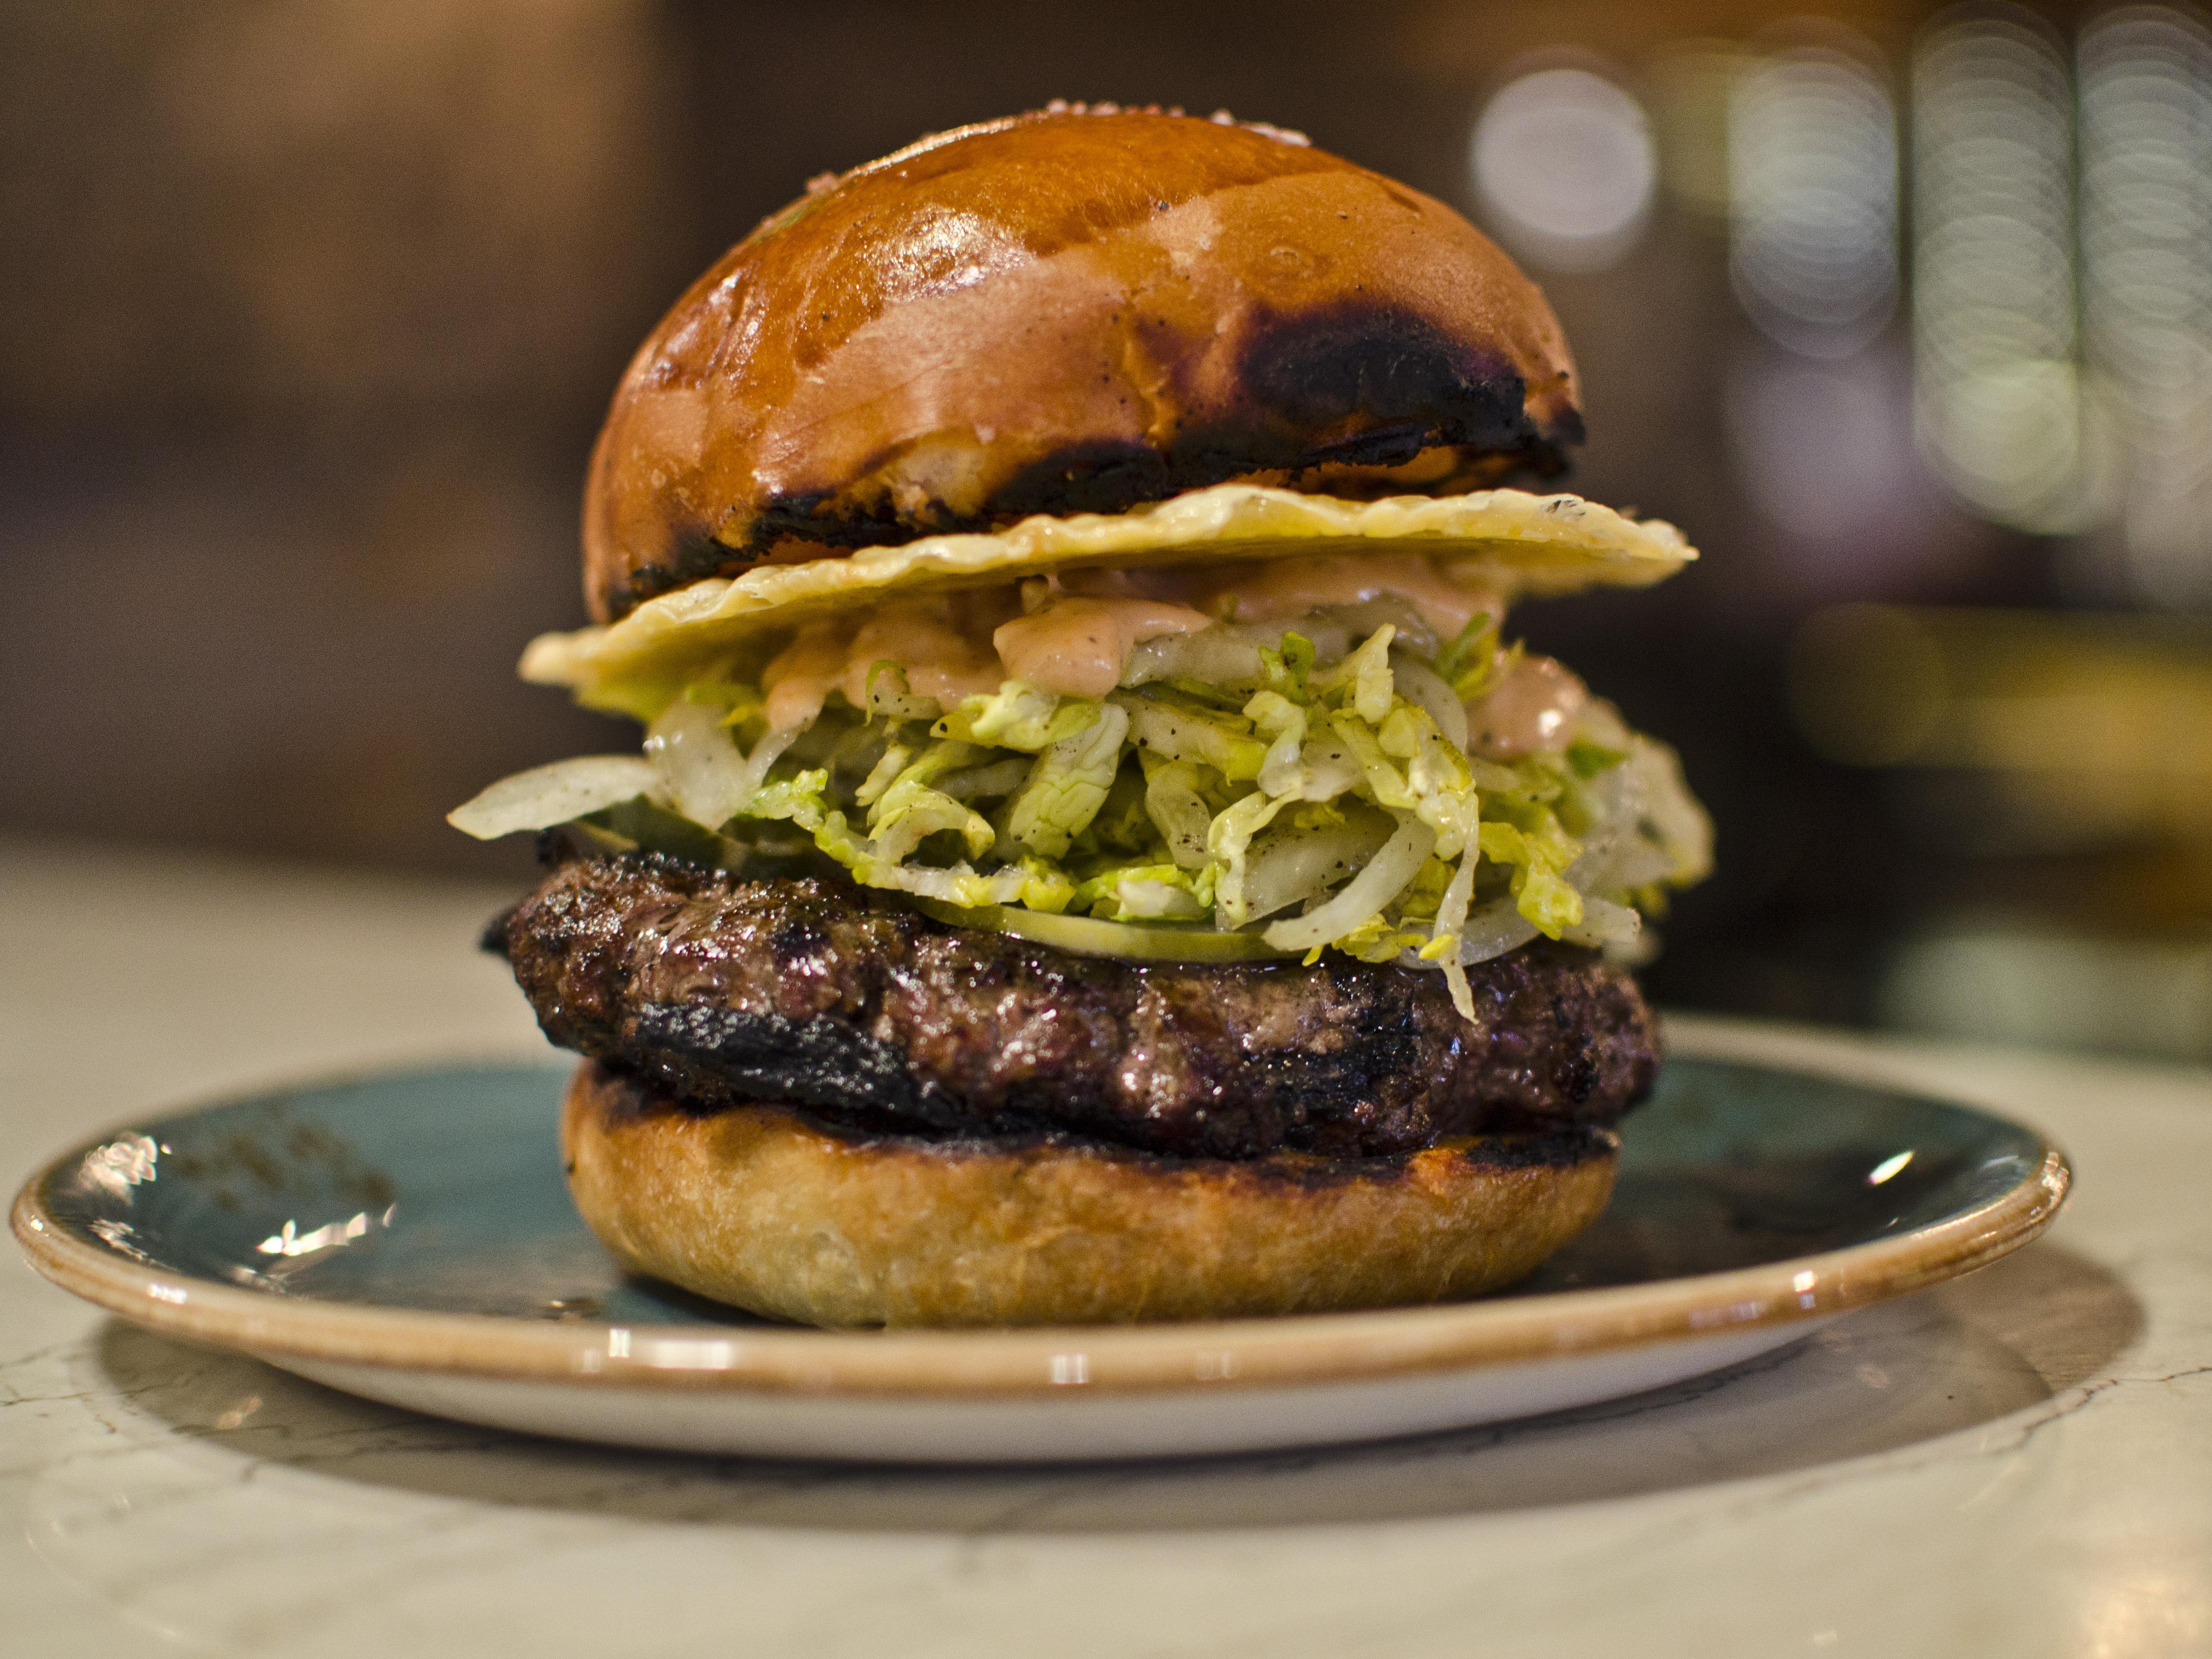 The burger at Alden & Harlow in Cambridge